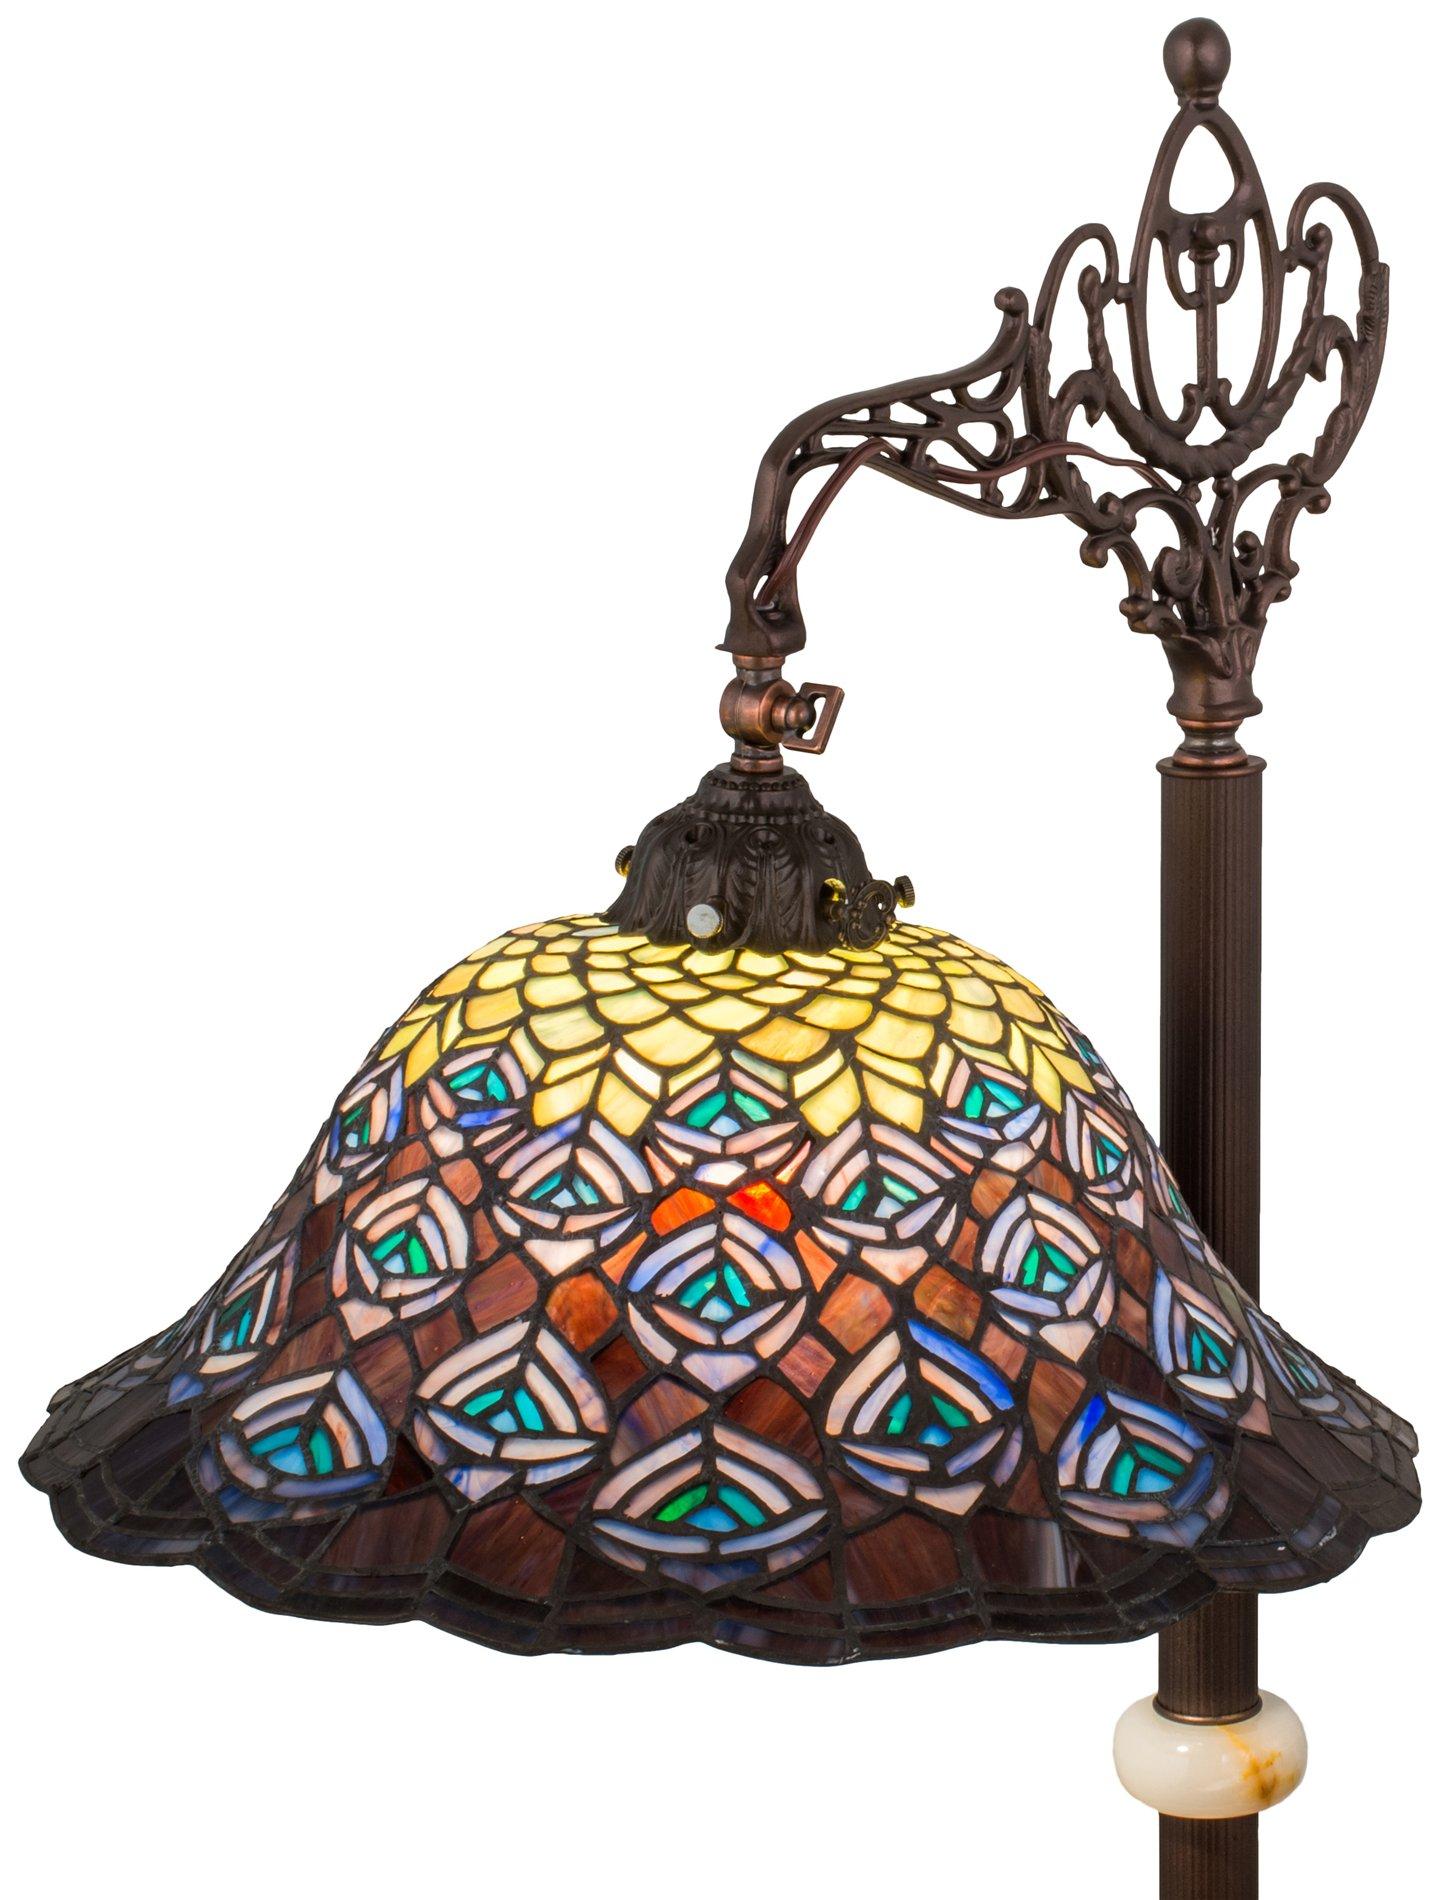 meyda tiffany 65840 peacock feathers downbridge tiffany floor lamp md. Black Bedroom Furniture Sets. Home Design Ideas